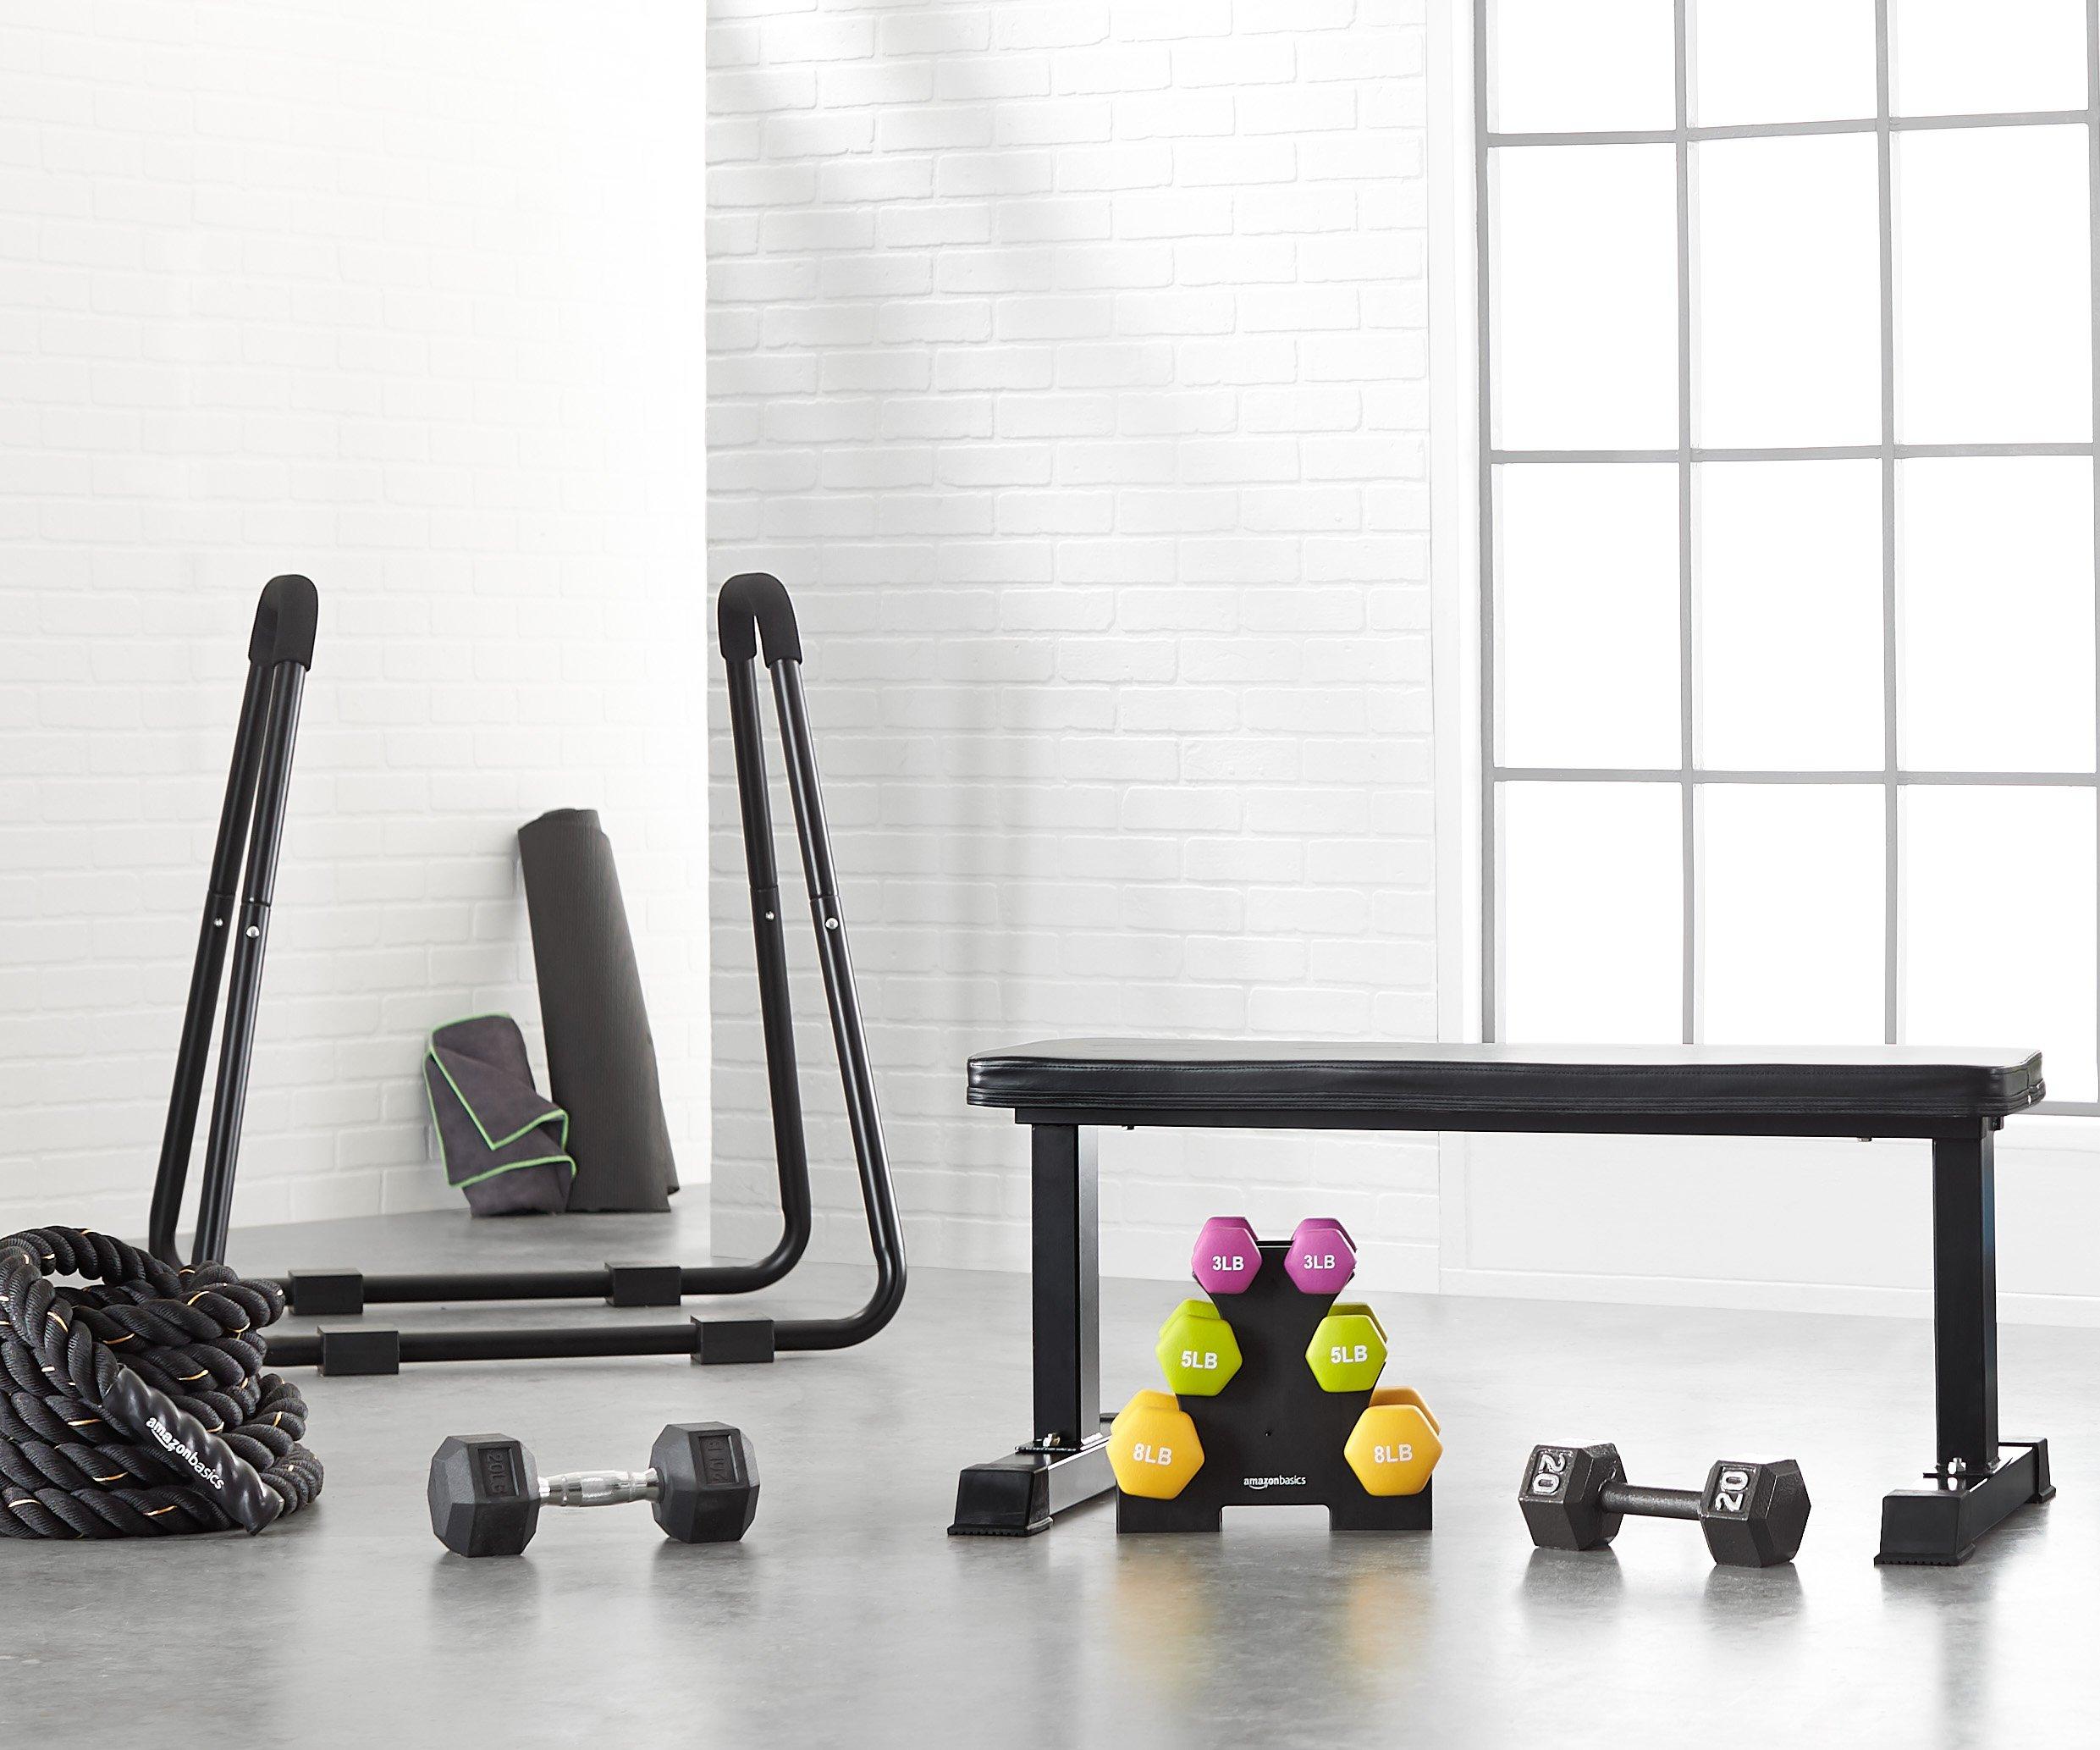 Amazon Basics Flat Weight Workout Exercise Bench 41 x 20 x 11 Inches, Black